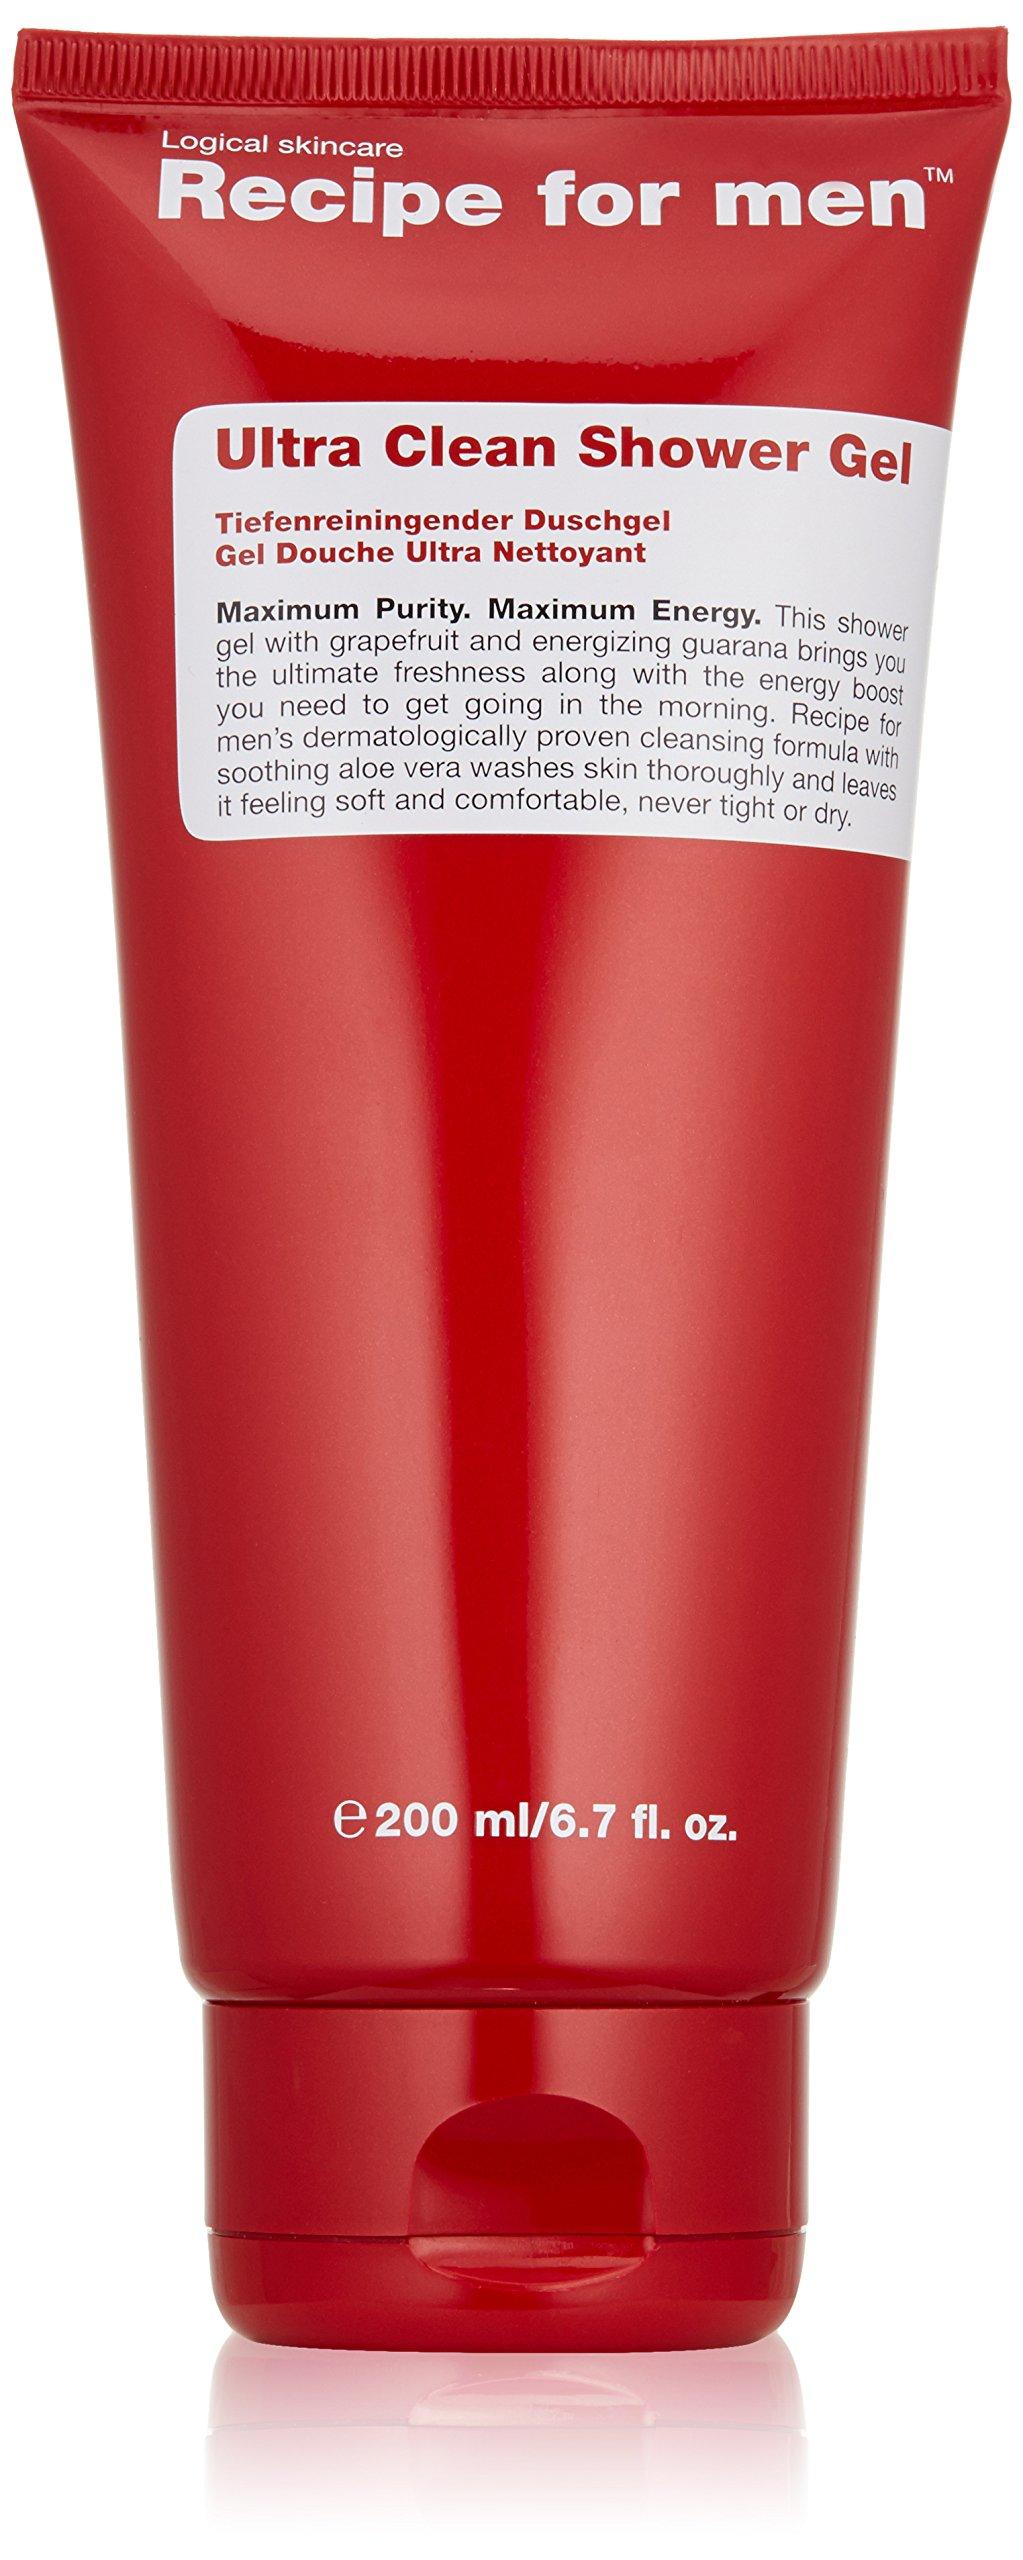 Recipe for Men Ultra Clean Shower Gel, 6.7 fl. oz.